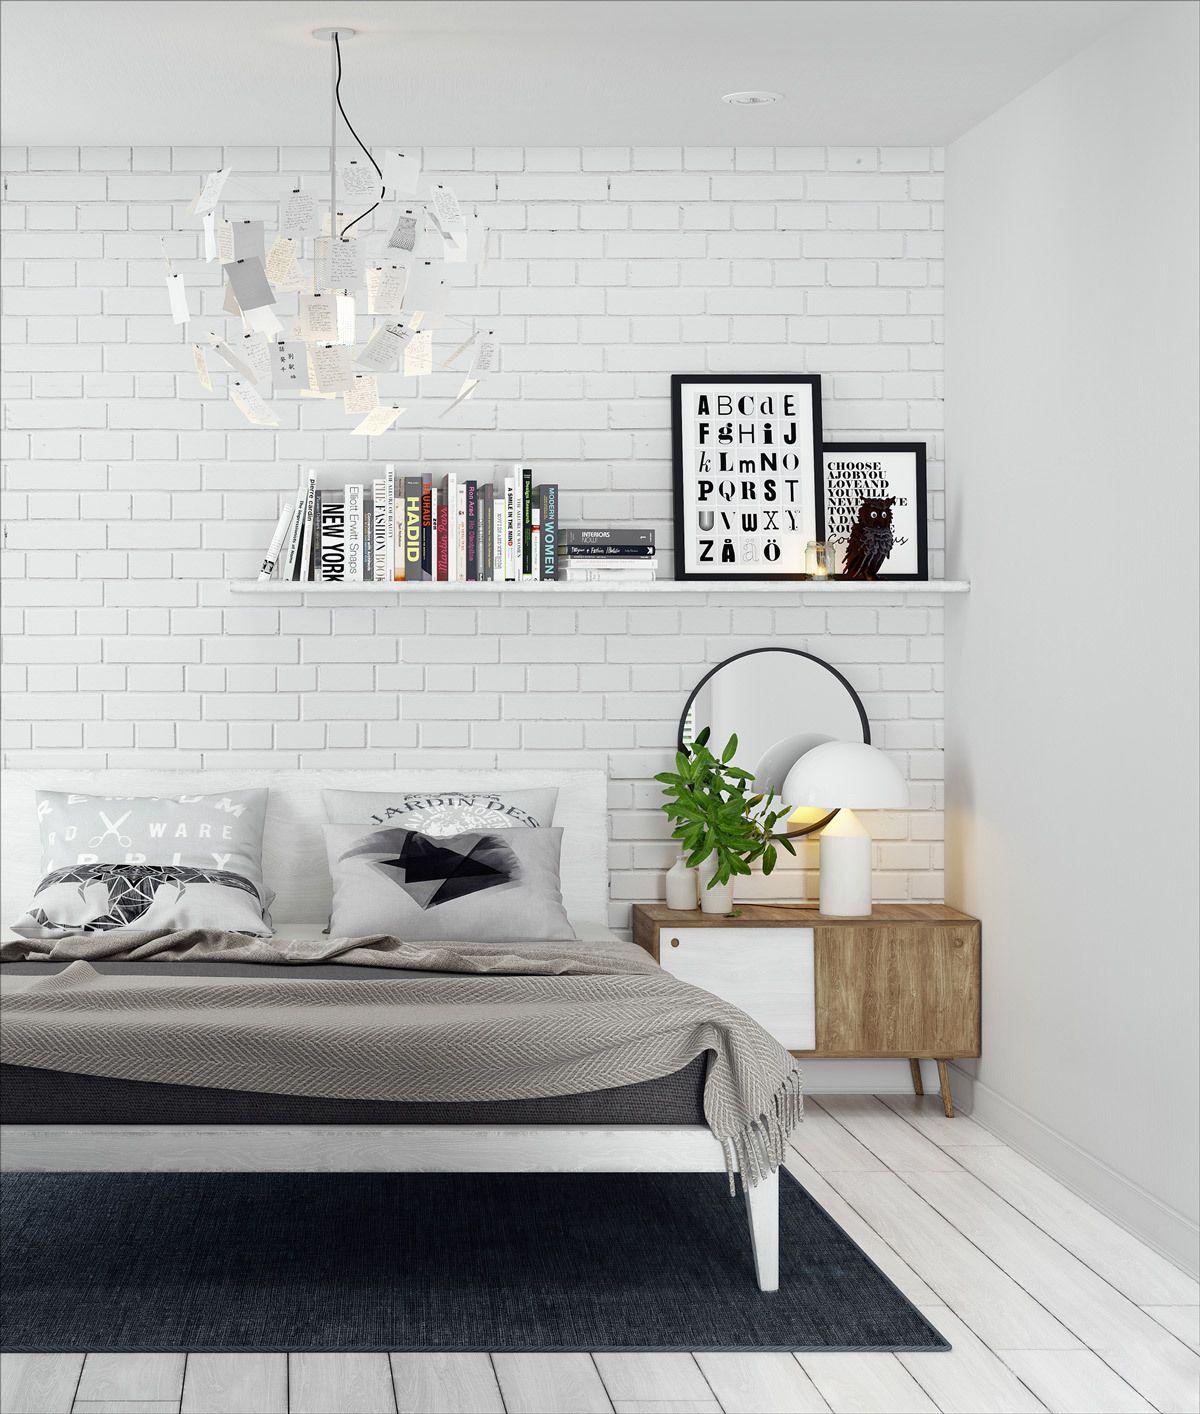 Via Homedesigning In 2020 Brick Interior Wall Brick Wall Bedroom Brick Interior